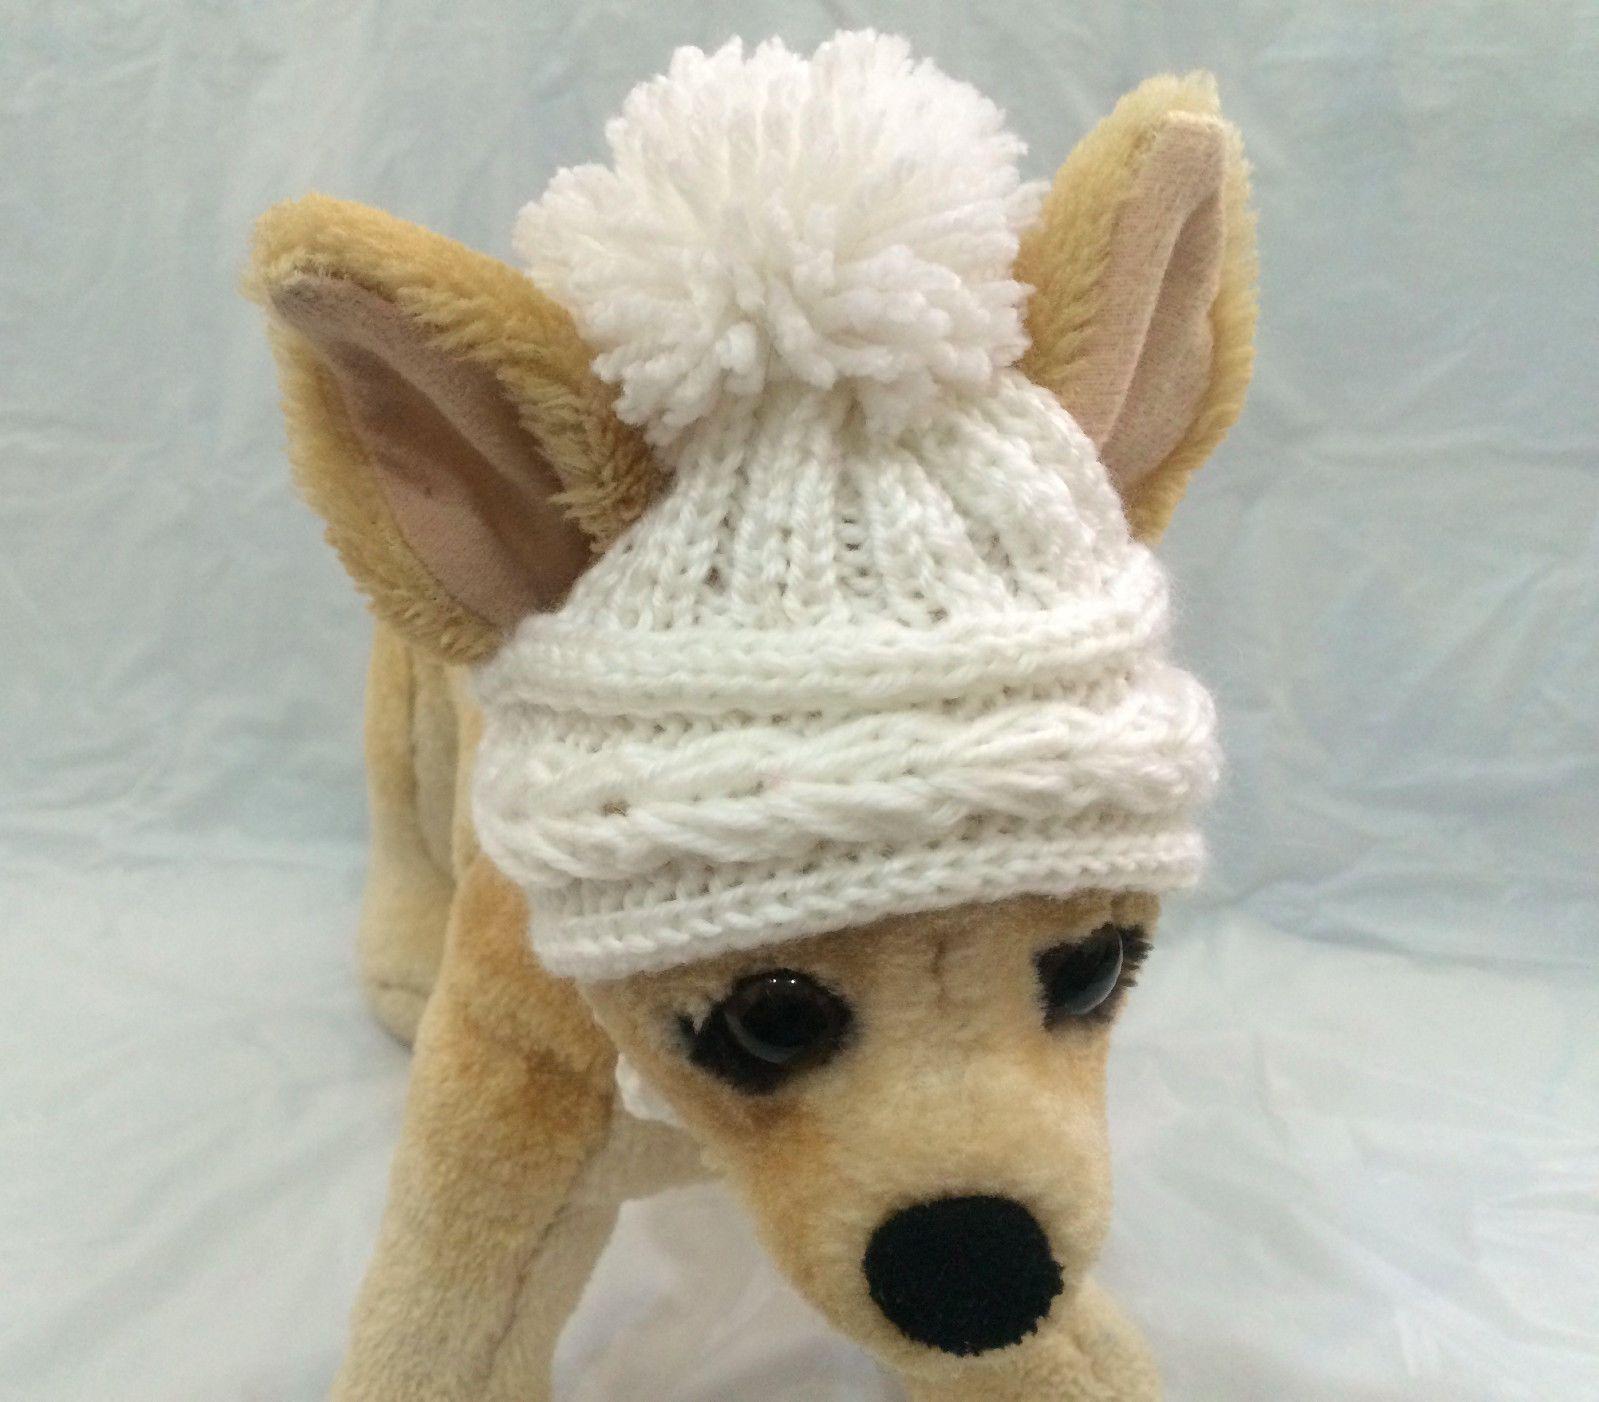 e93e717d433  12 - Pet Clothes Apparel Hand-Knit Pom-Pom Hat For Small Dog And Cat Xxs Xs  S  ebay  Home   Garden